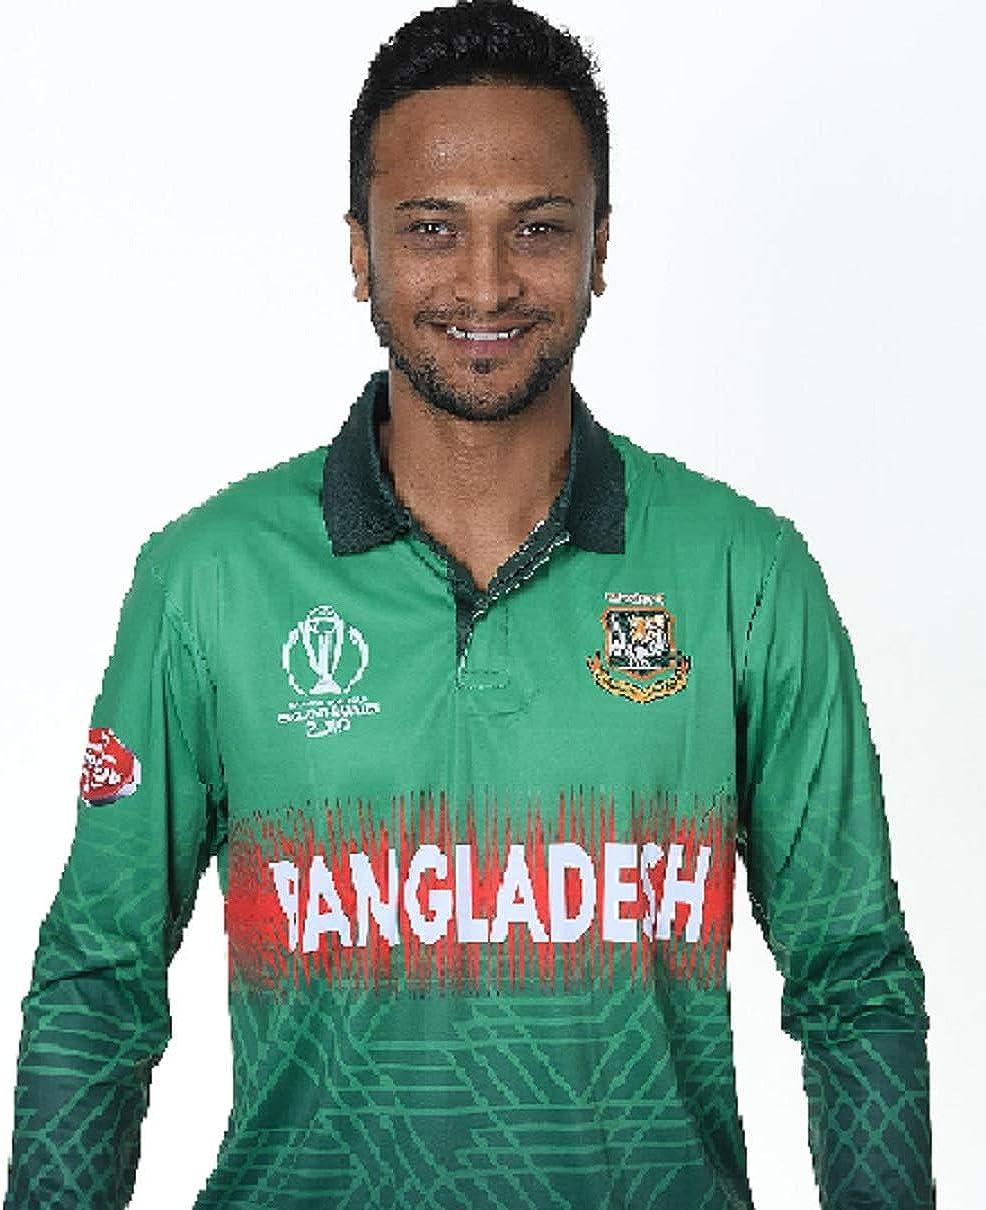 Bangladesh Cricket Team World Cup 2019 Jersey Fan Jersey